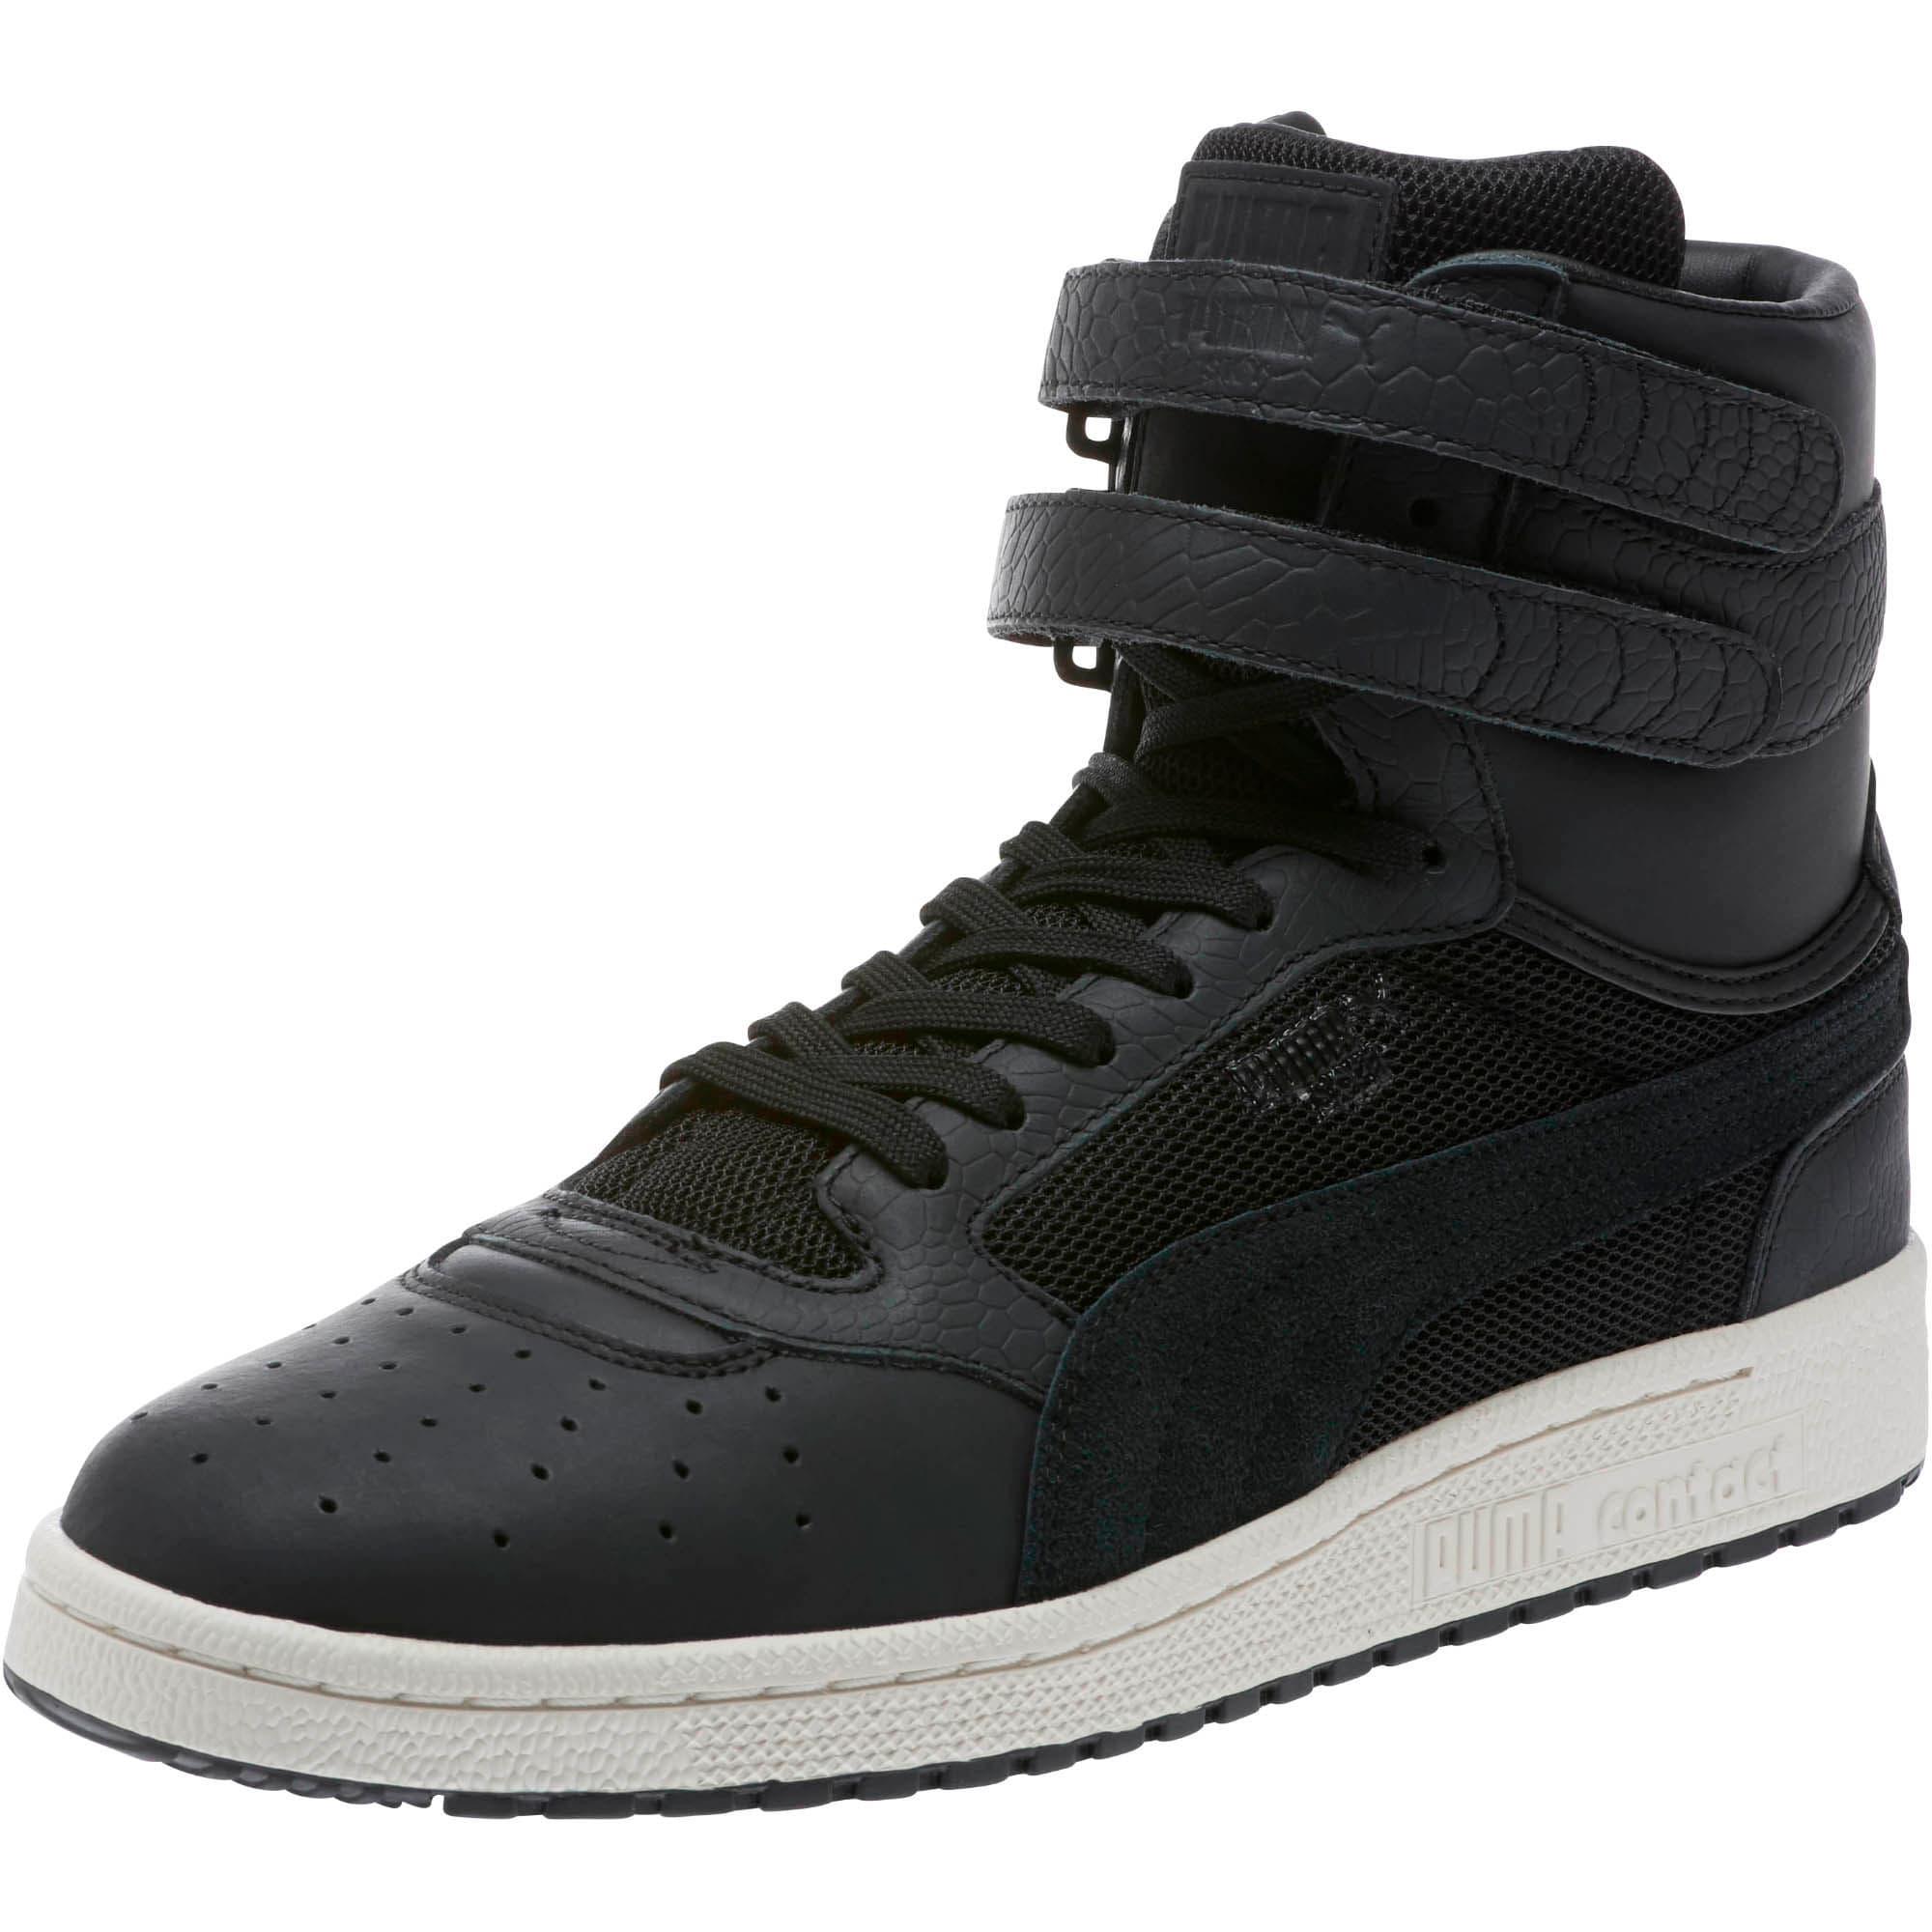 Sky II Hi Colorblocked Leather Sneakers